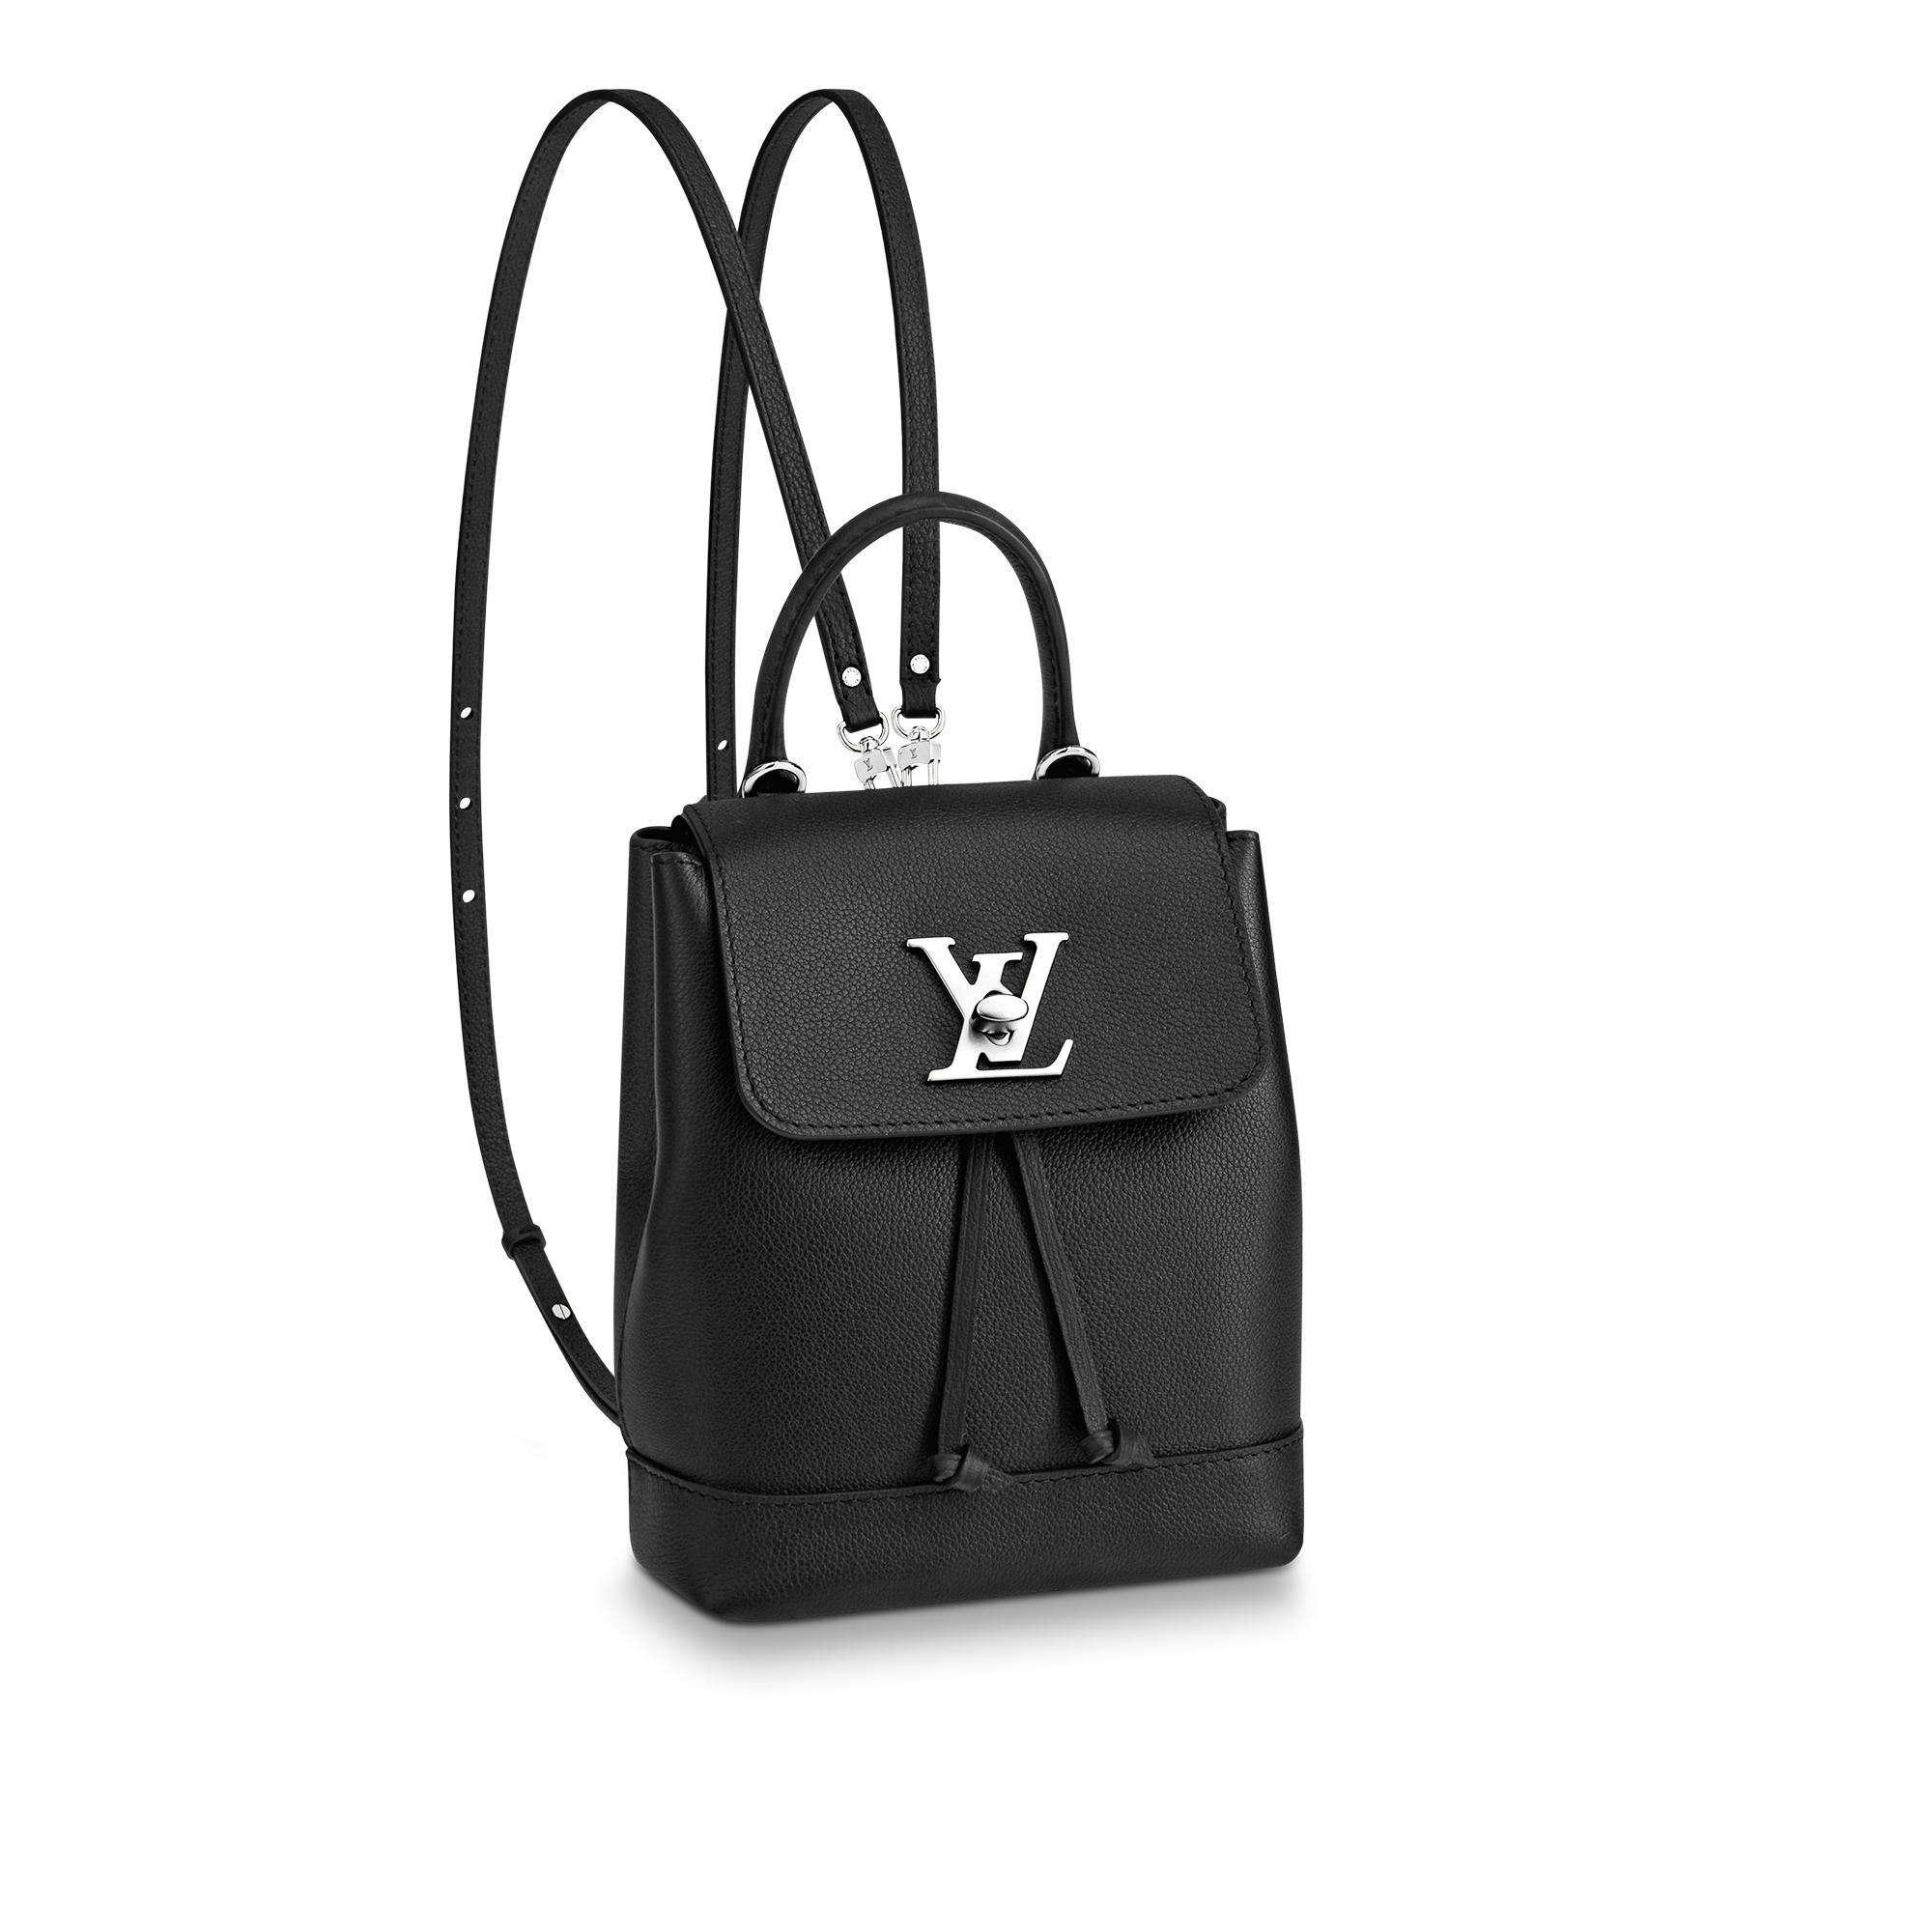 9c3e39294a8f Louis Vuitton Lockme Backpack Mini In Noir